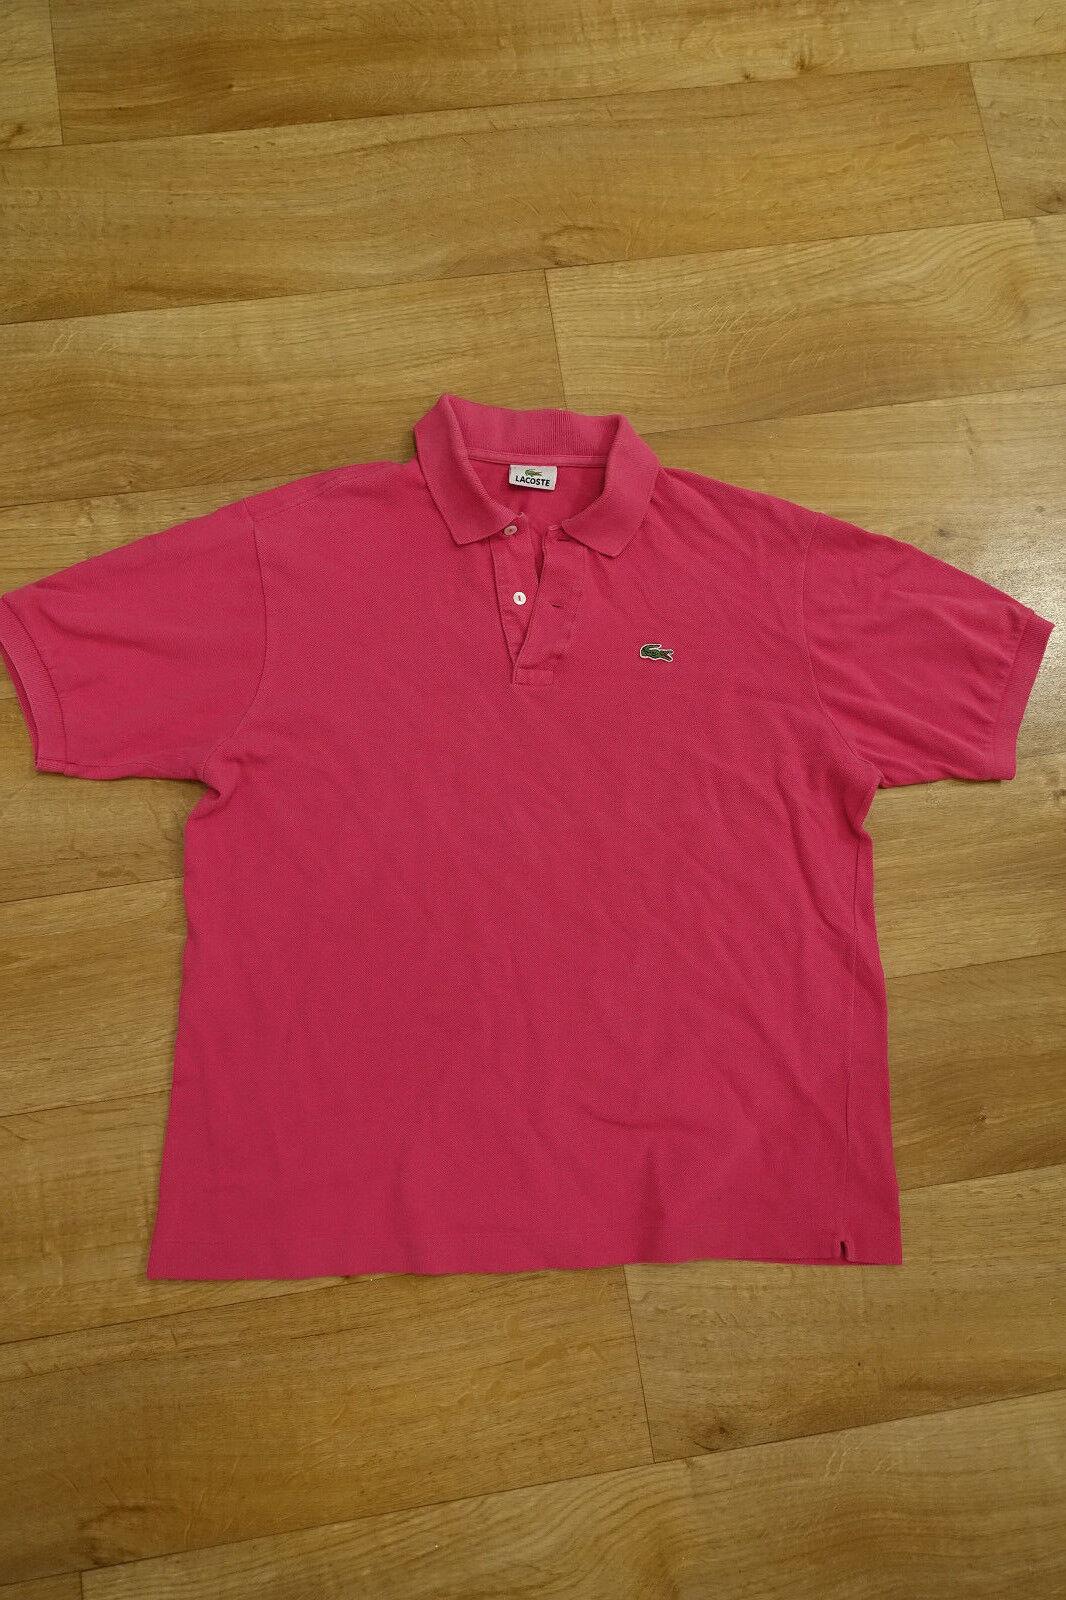 fa32d5bc8 Lacoste men original homme shirt size 6 pink pink polo XL noqmdg6274-Coats  & Jackets